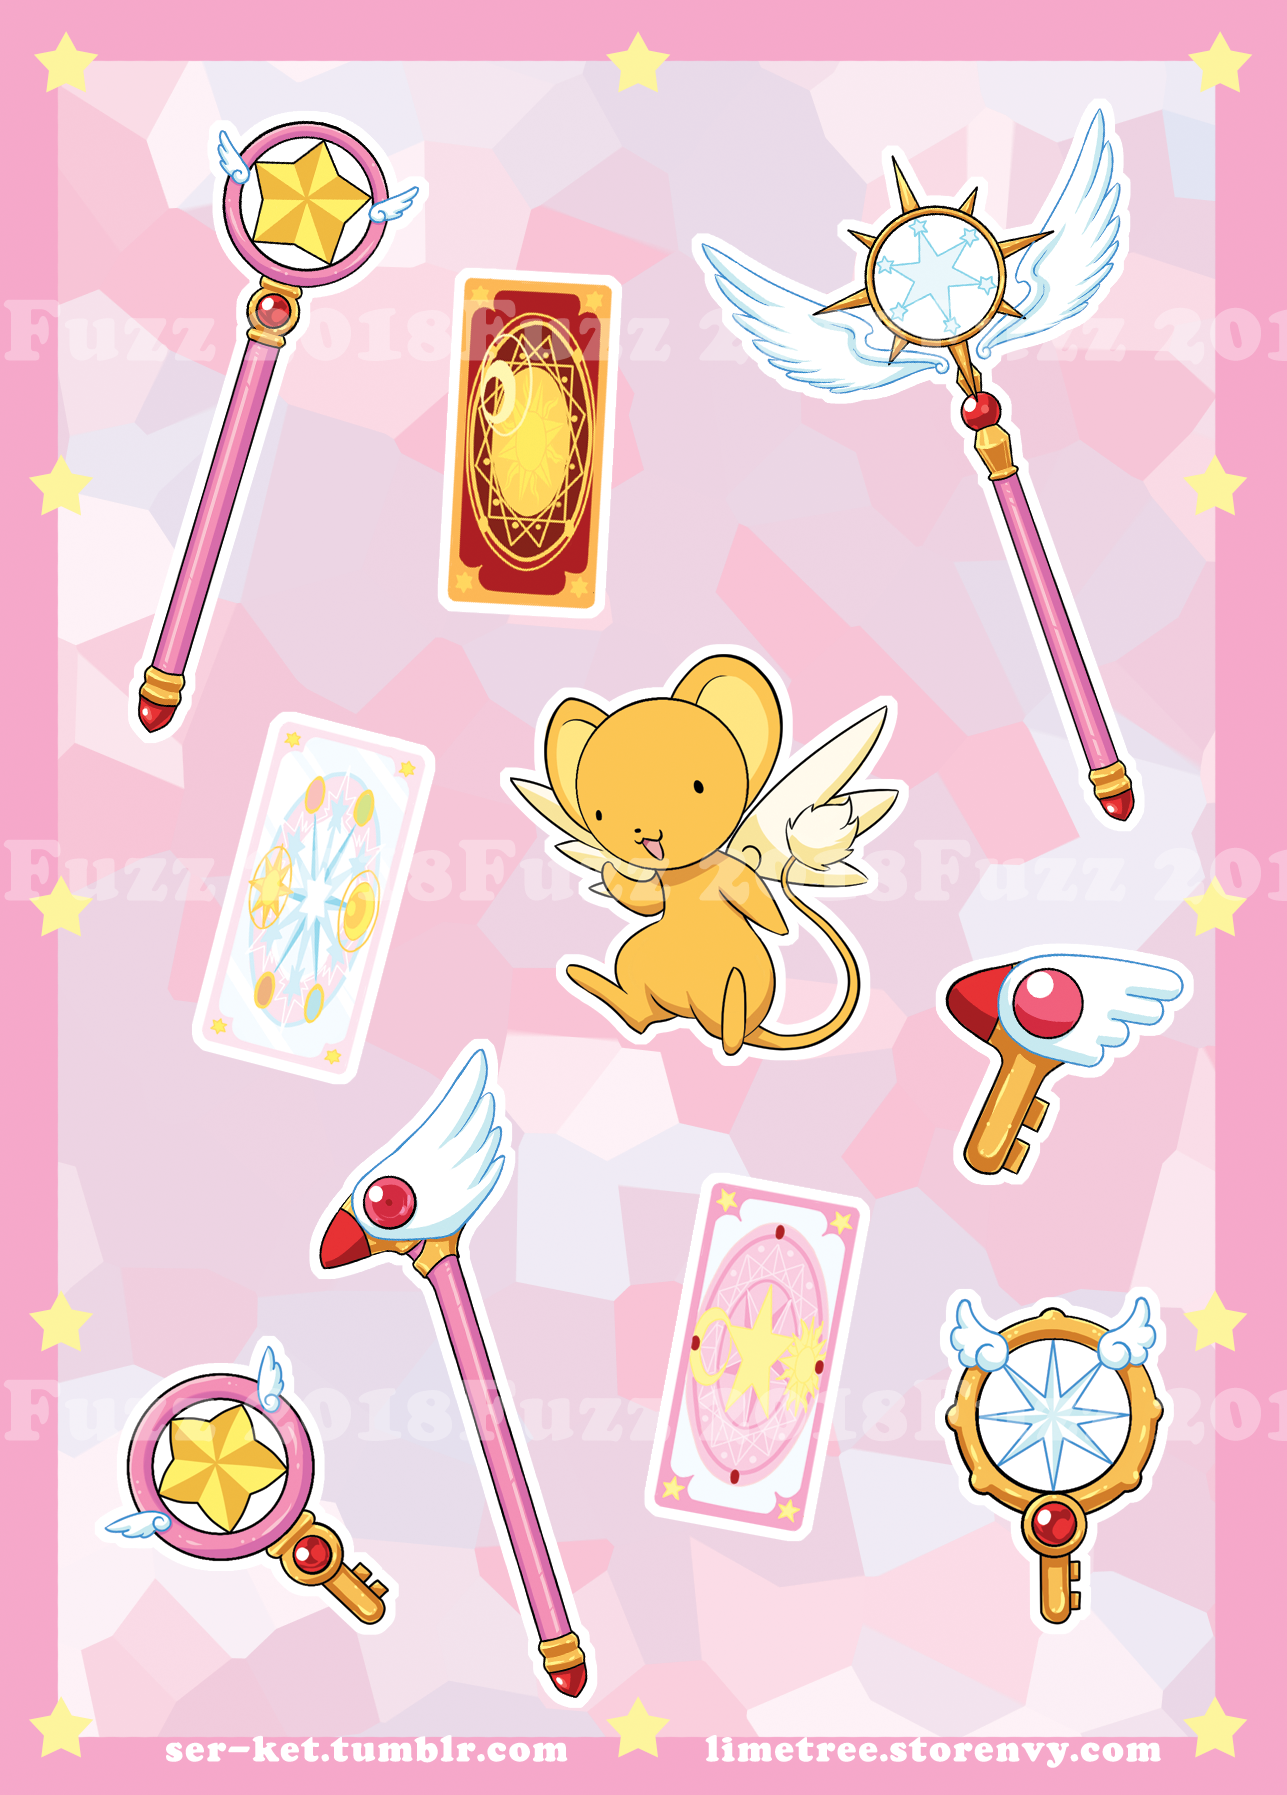 Cardcaptor Sakura Sticker Sheet Cardcaptor Sakura Sakura Tattoo Cardcaptor